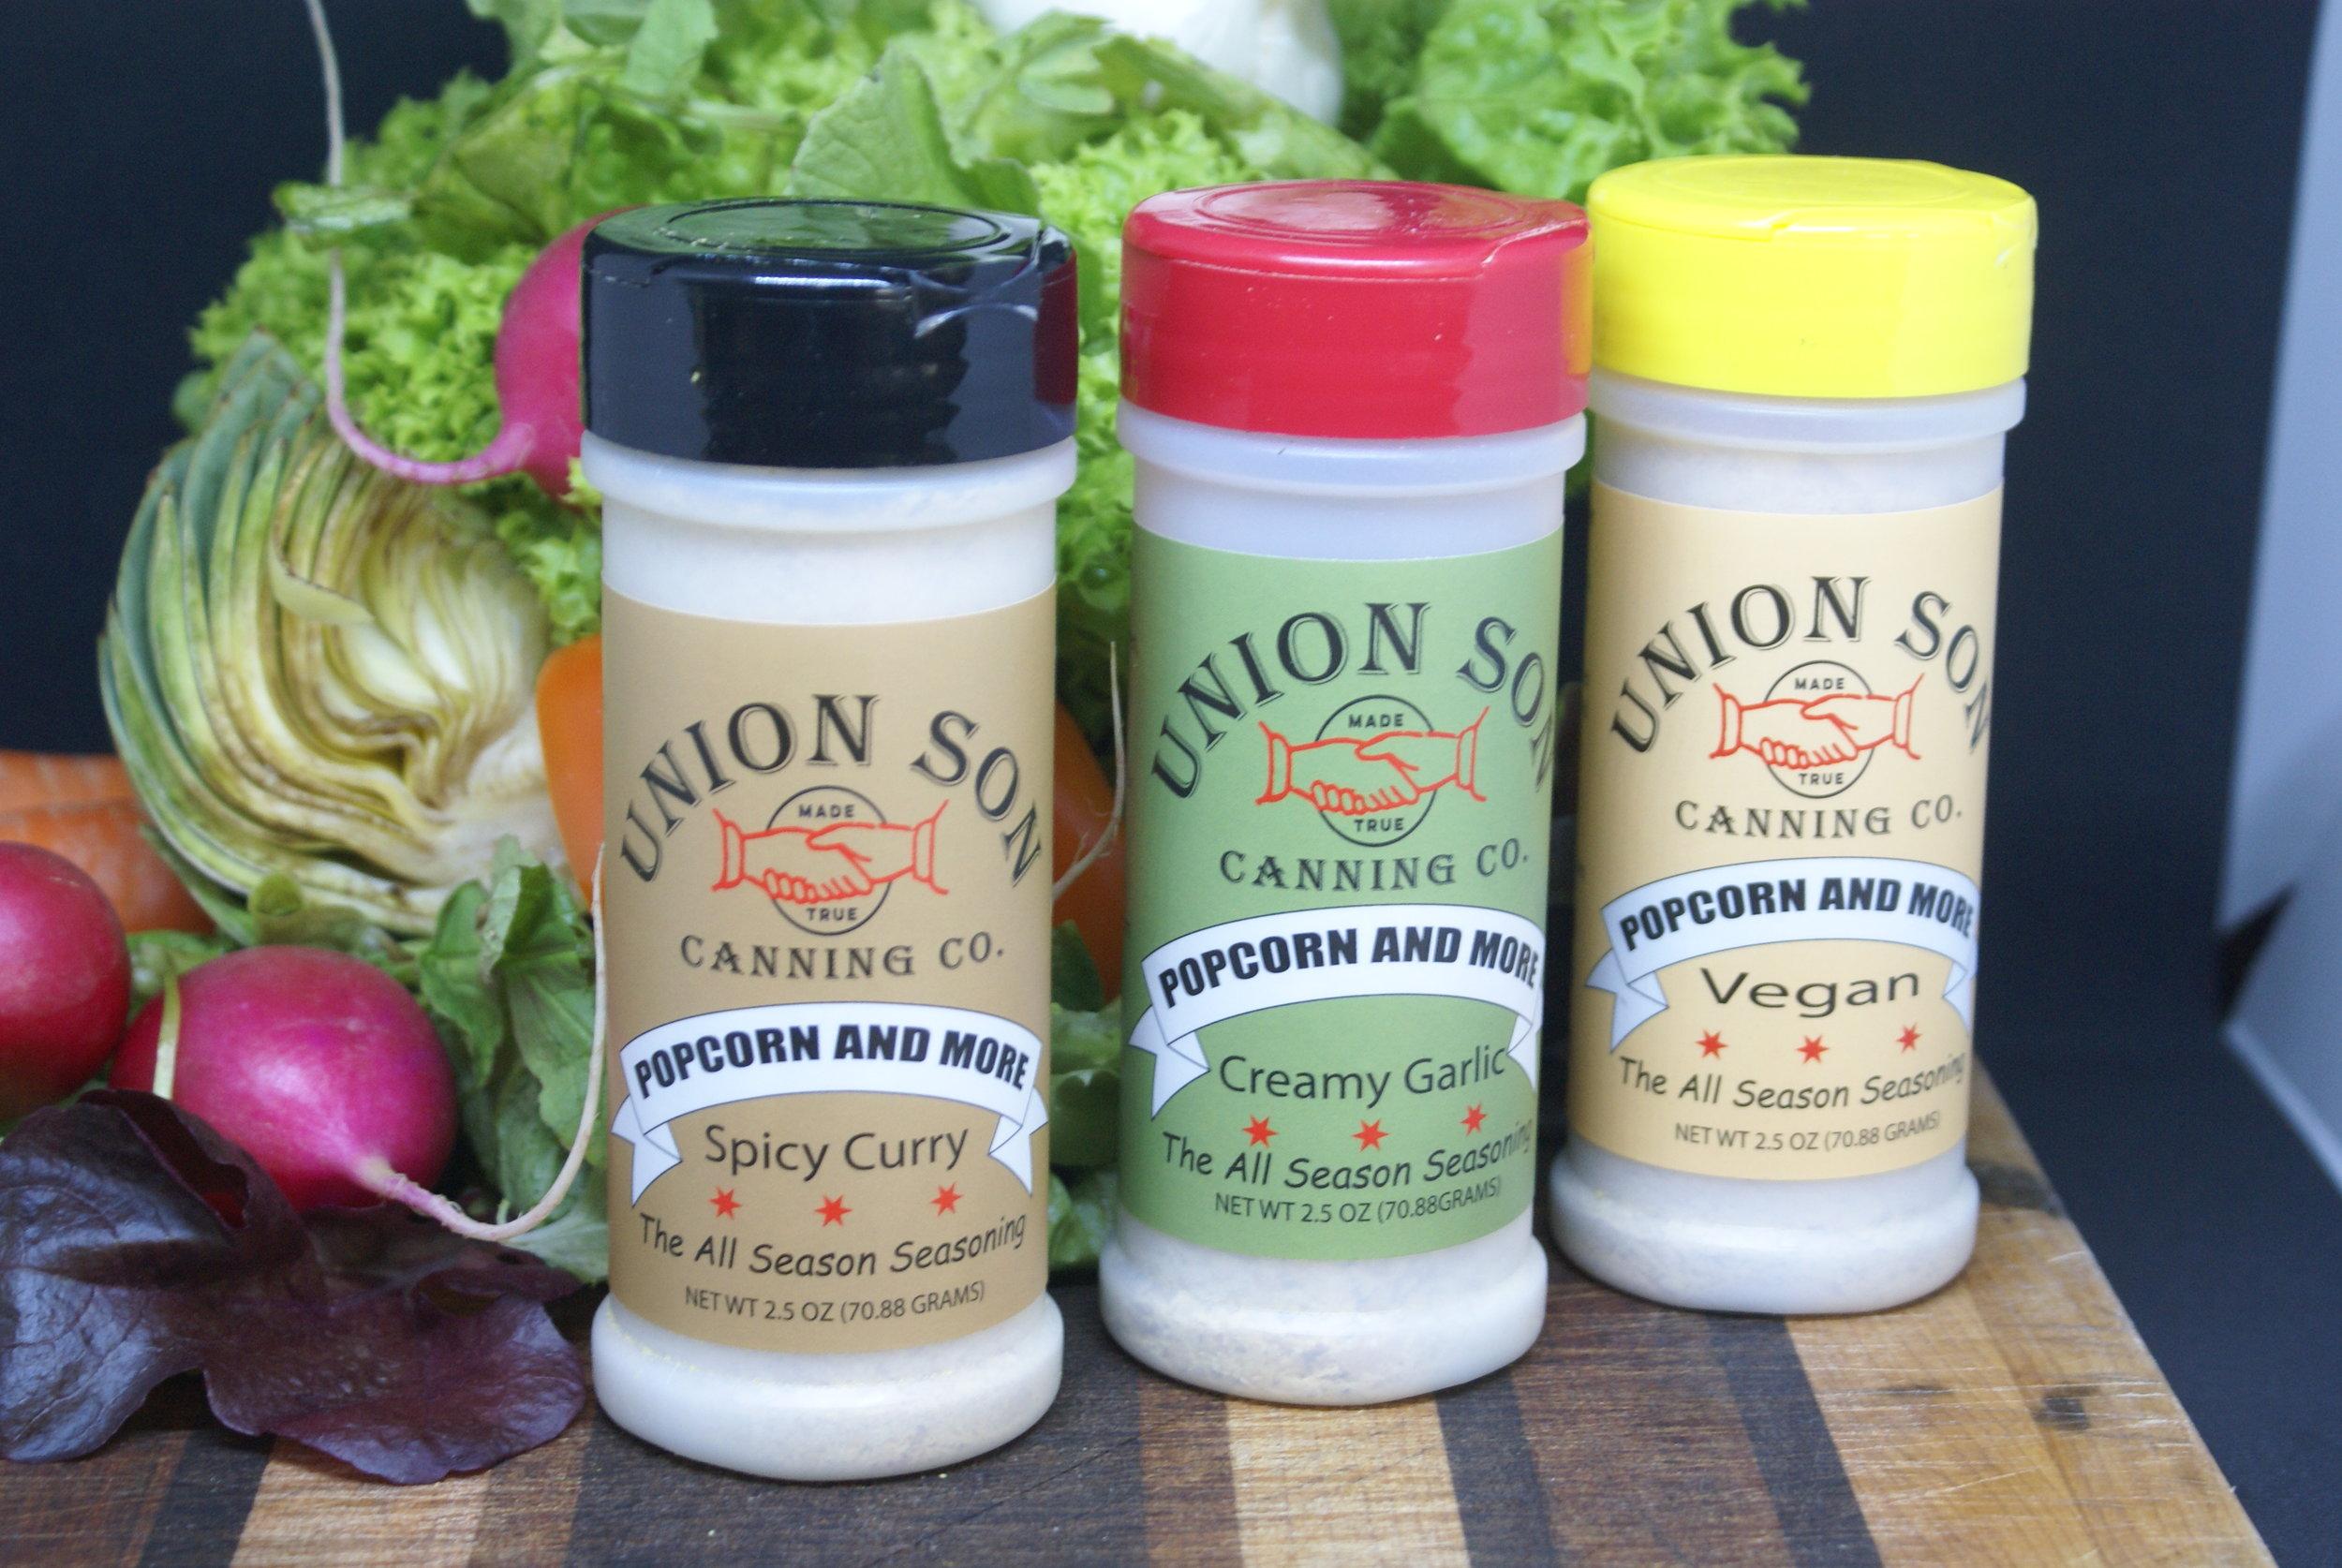 Union Son Product Shots 3.JPG